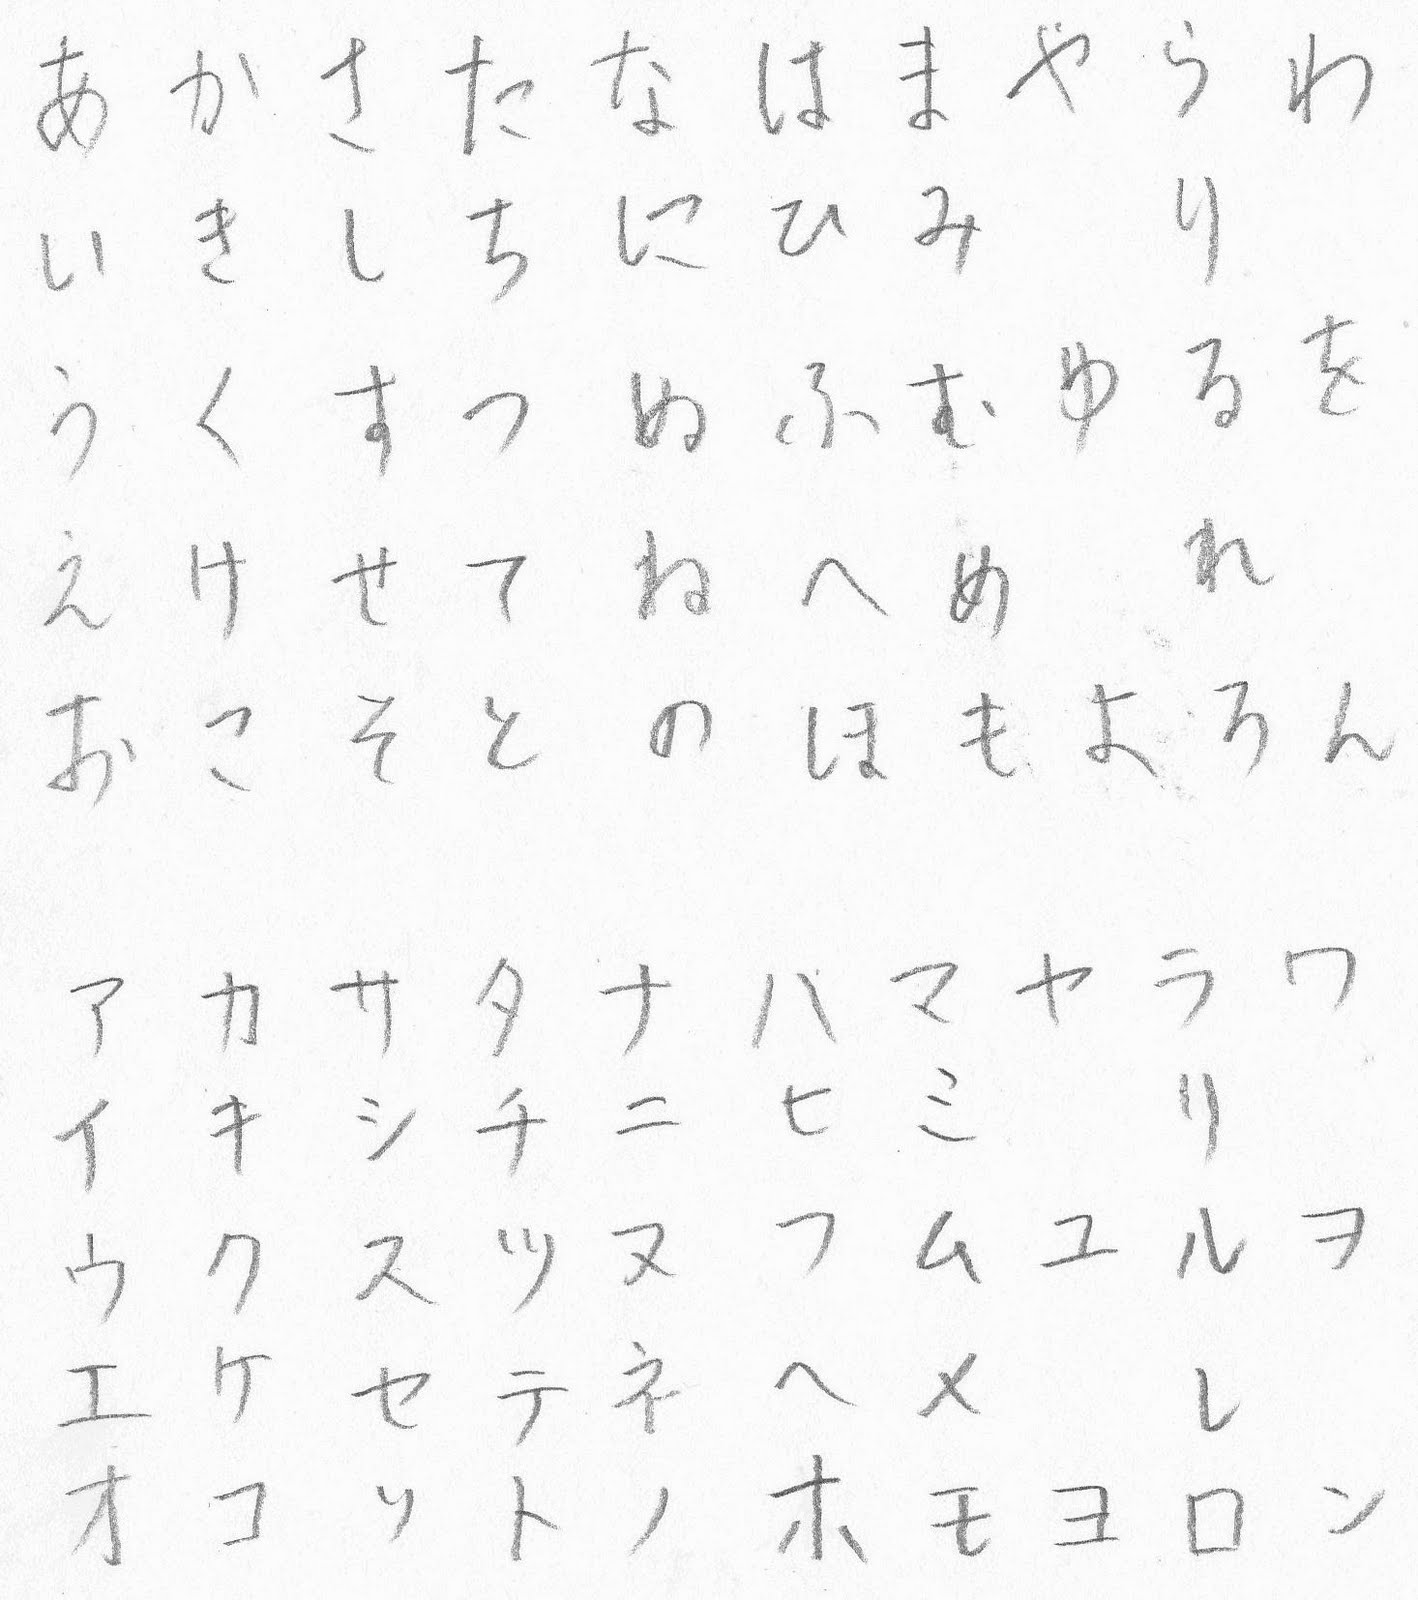 Hiragana Handwriting: Majestic Jester's Wonderbloggium: How To Write Japanese Neatly